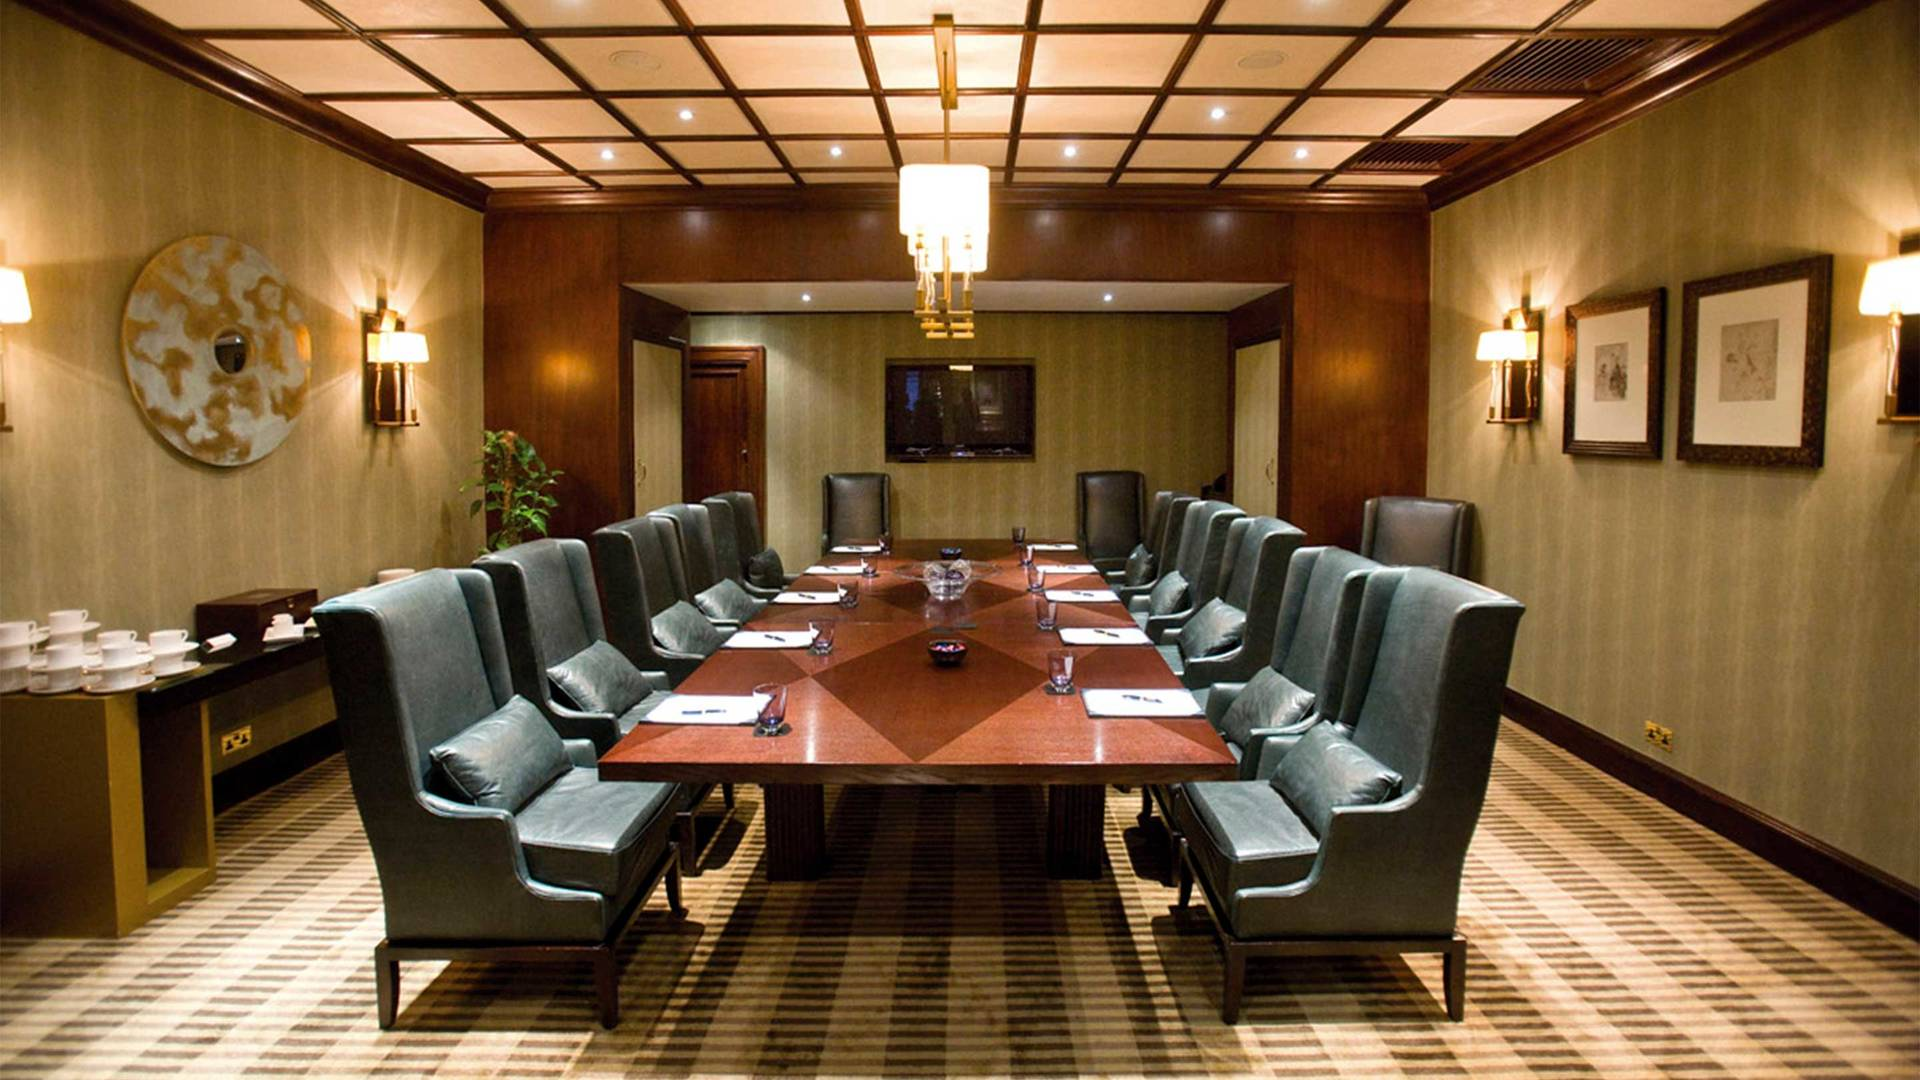 https://cdn.jumeirah.com/-/mediadh/DH/Hospitality/Jumeirah/Occasion/Dubai/Burj-Al-Arab/Al-Naseem-Al-Qasr-Dar-Al-Masyaf-A-Salam/Venues/16-9_Boardroom.jpg?h=1080&w=1920&hash=8324D82B9A61D61C327561F42F35ACA9